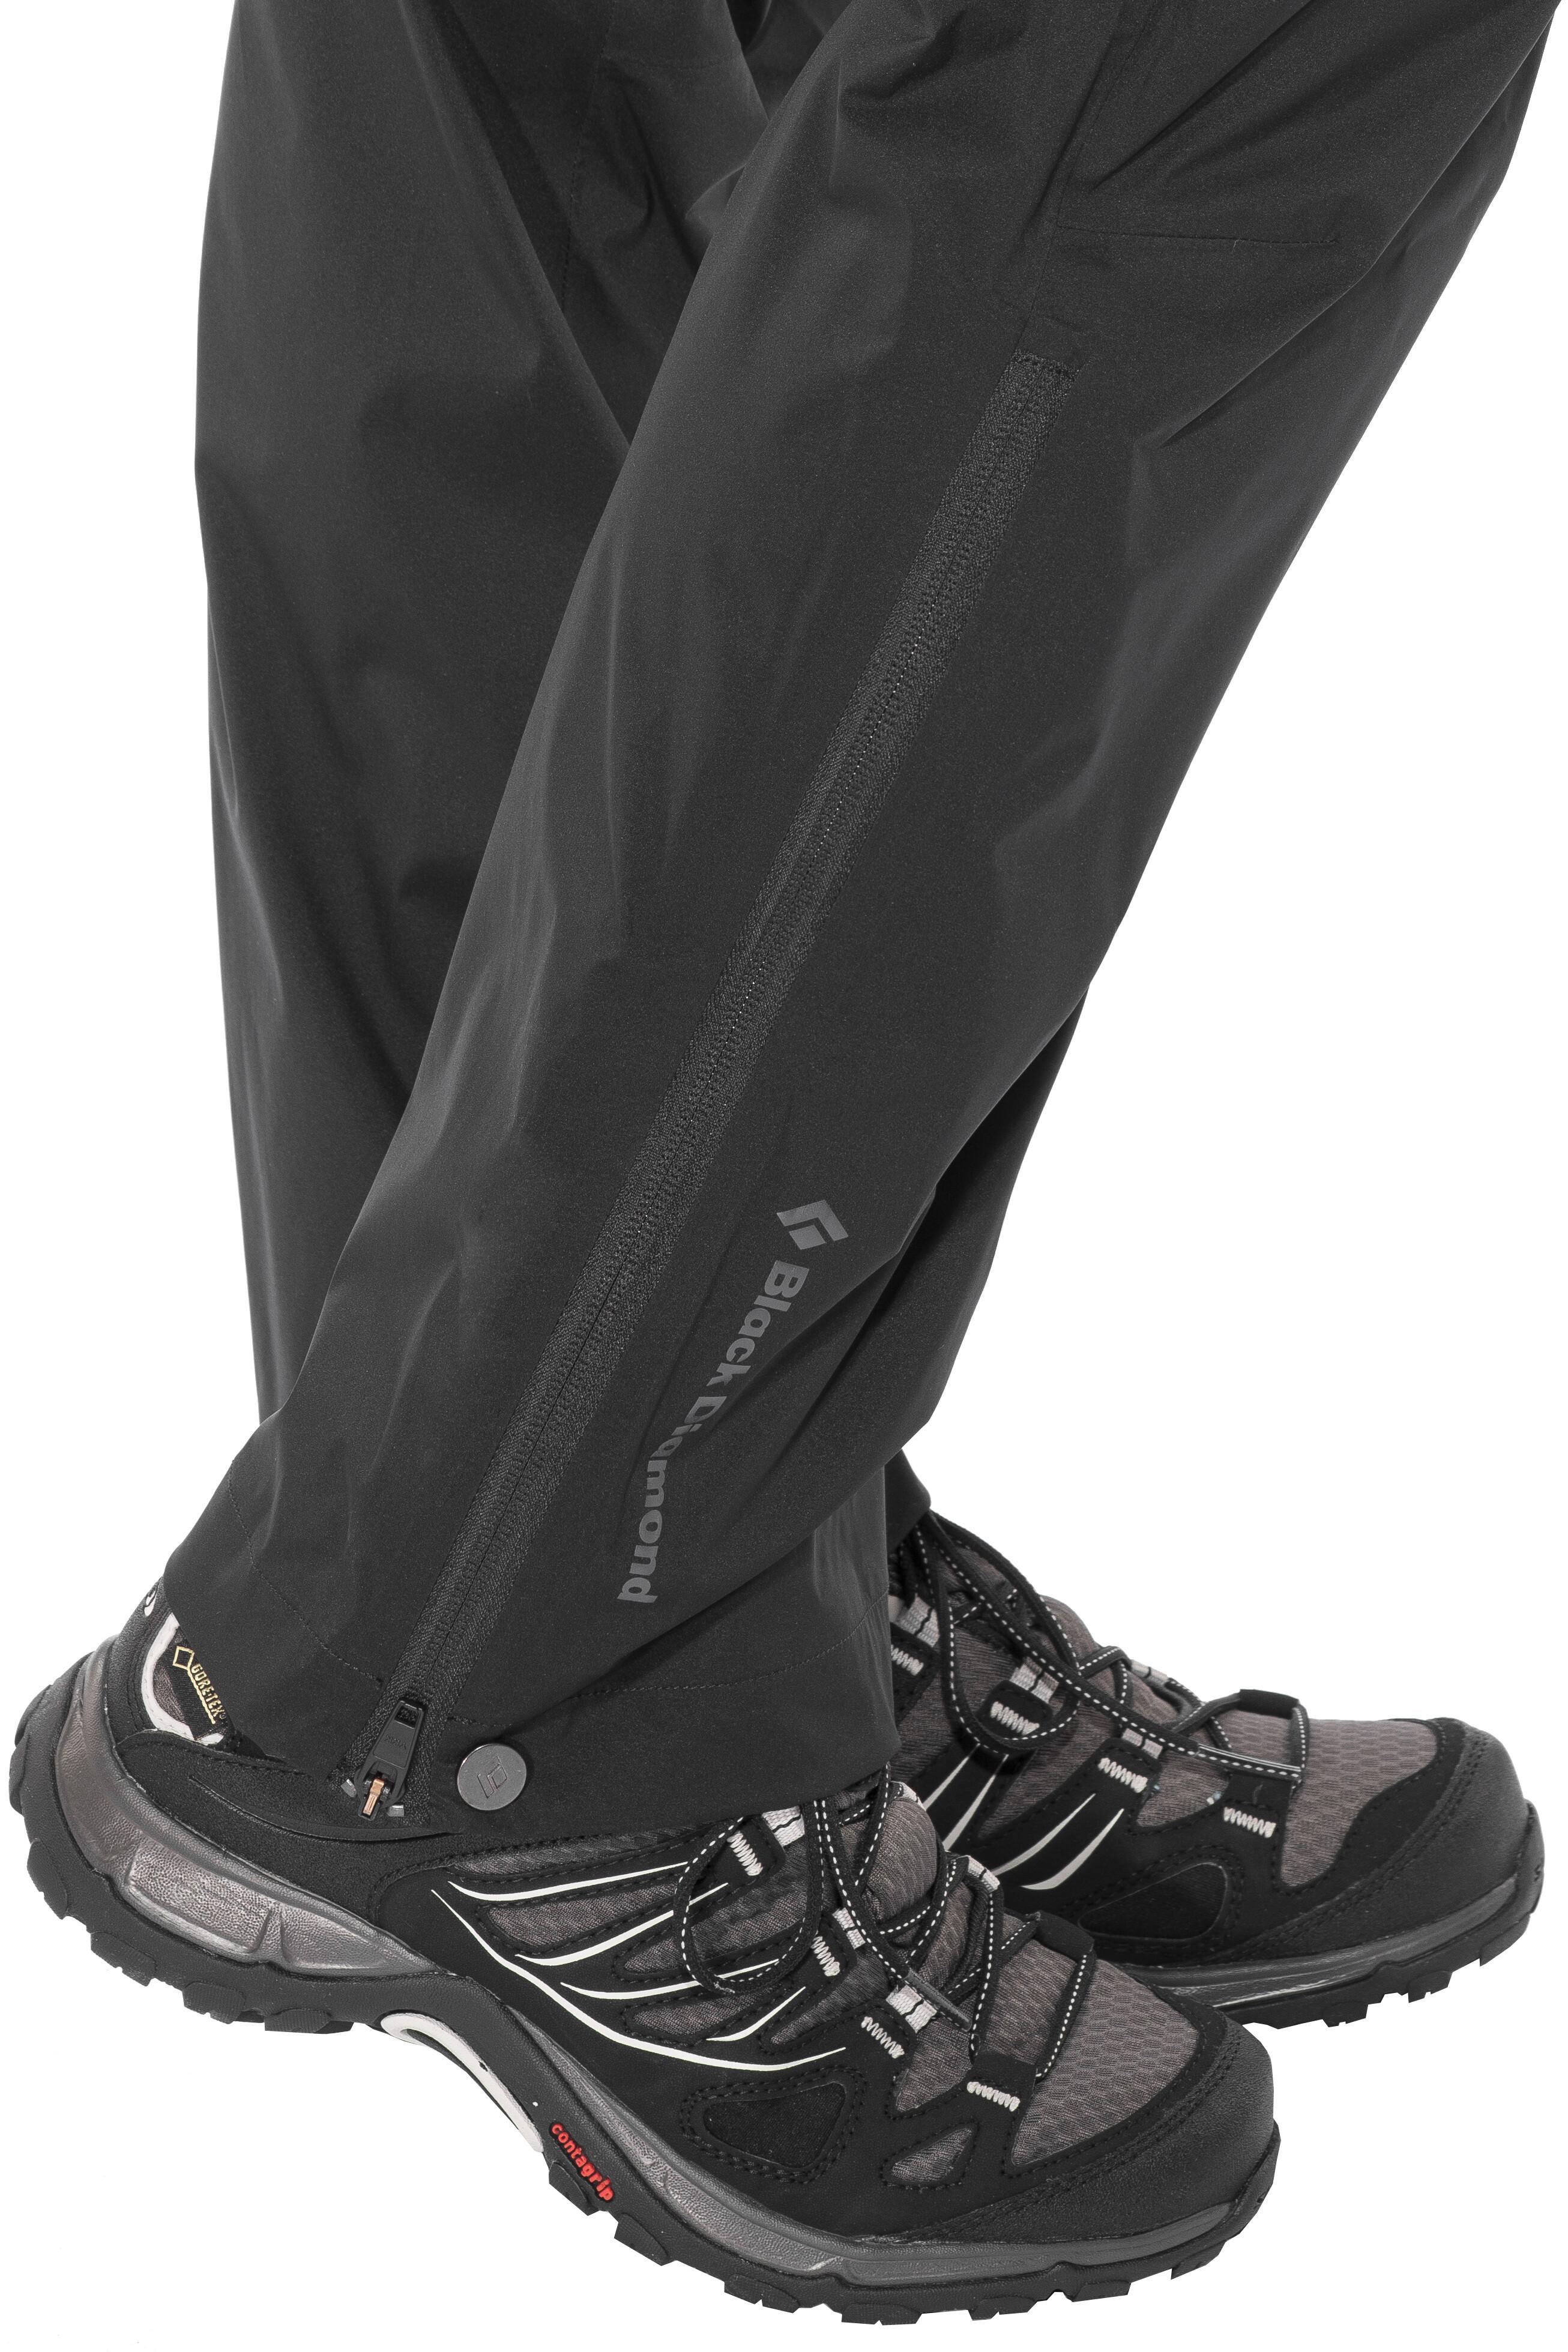 6de71c441ff Black Diamond Stormline Pants Women black at Addnature.co.uk